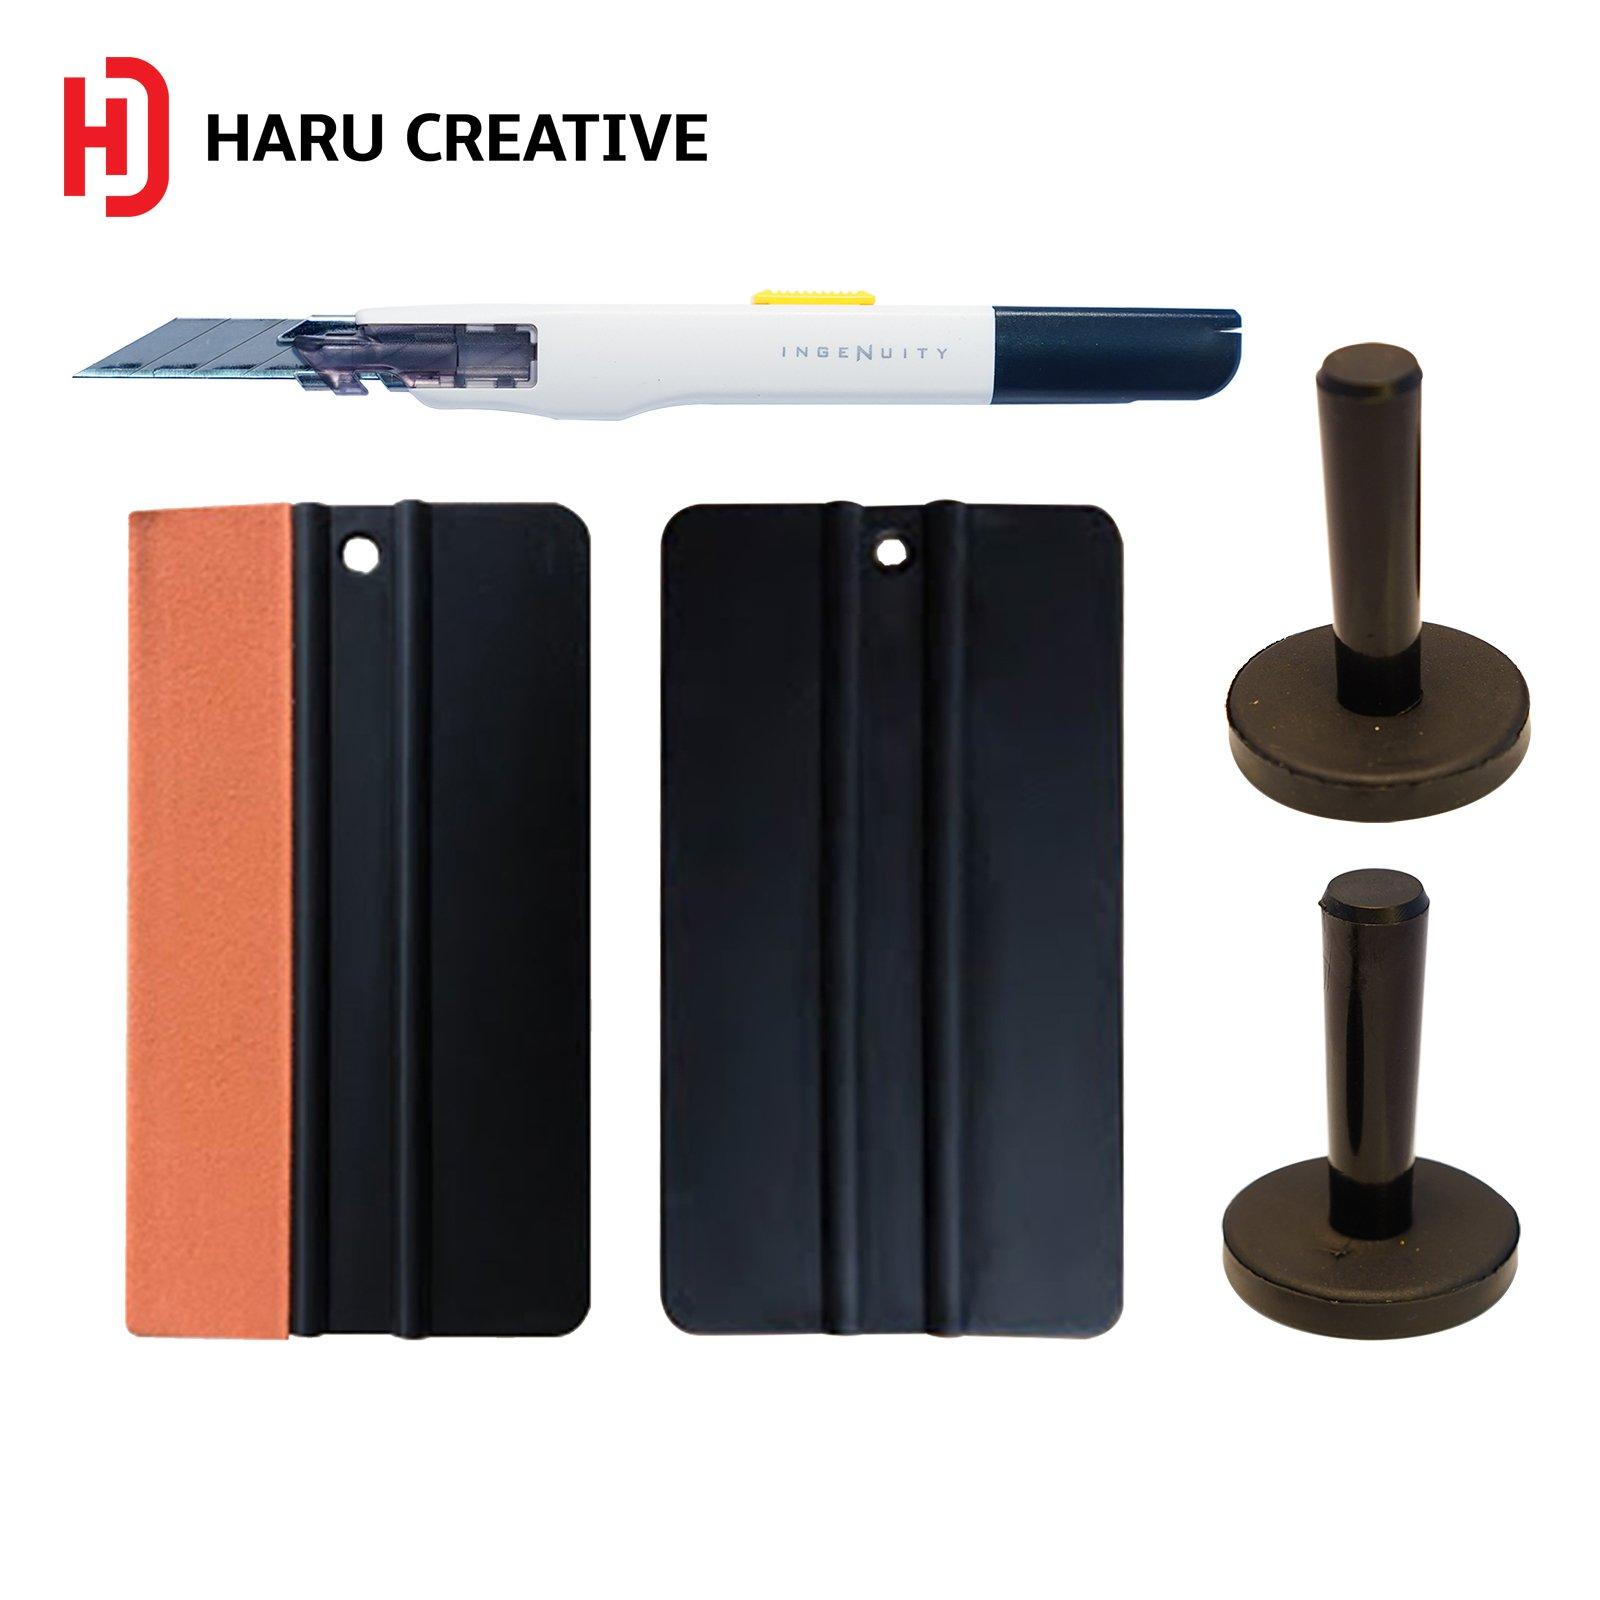 Haru Creative - Automotive Car Tool Kit for Car Vinyl Wrapping Window Tinting Installation Professional Grade Kit - Car Magnets Felt Edge Squeegee Razor Knife